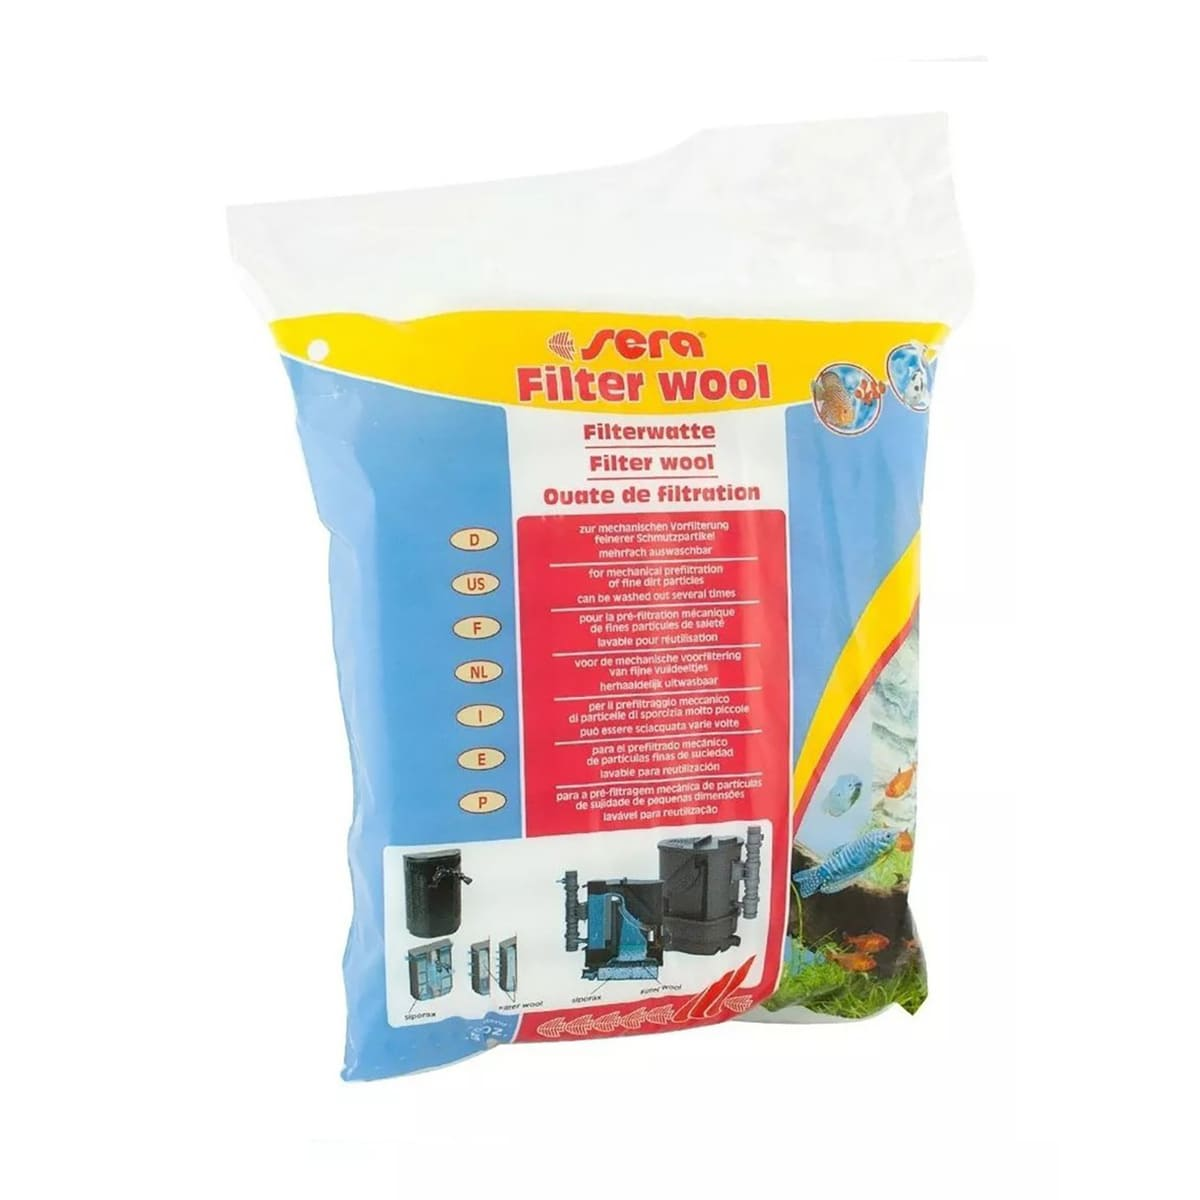 Perlon Sera Filter Wool 250g Retém Sujeira E Partículas